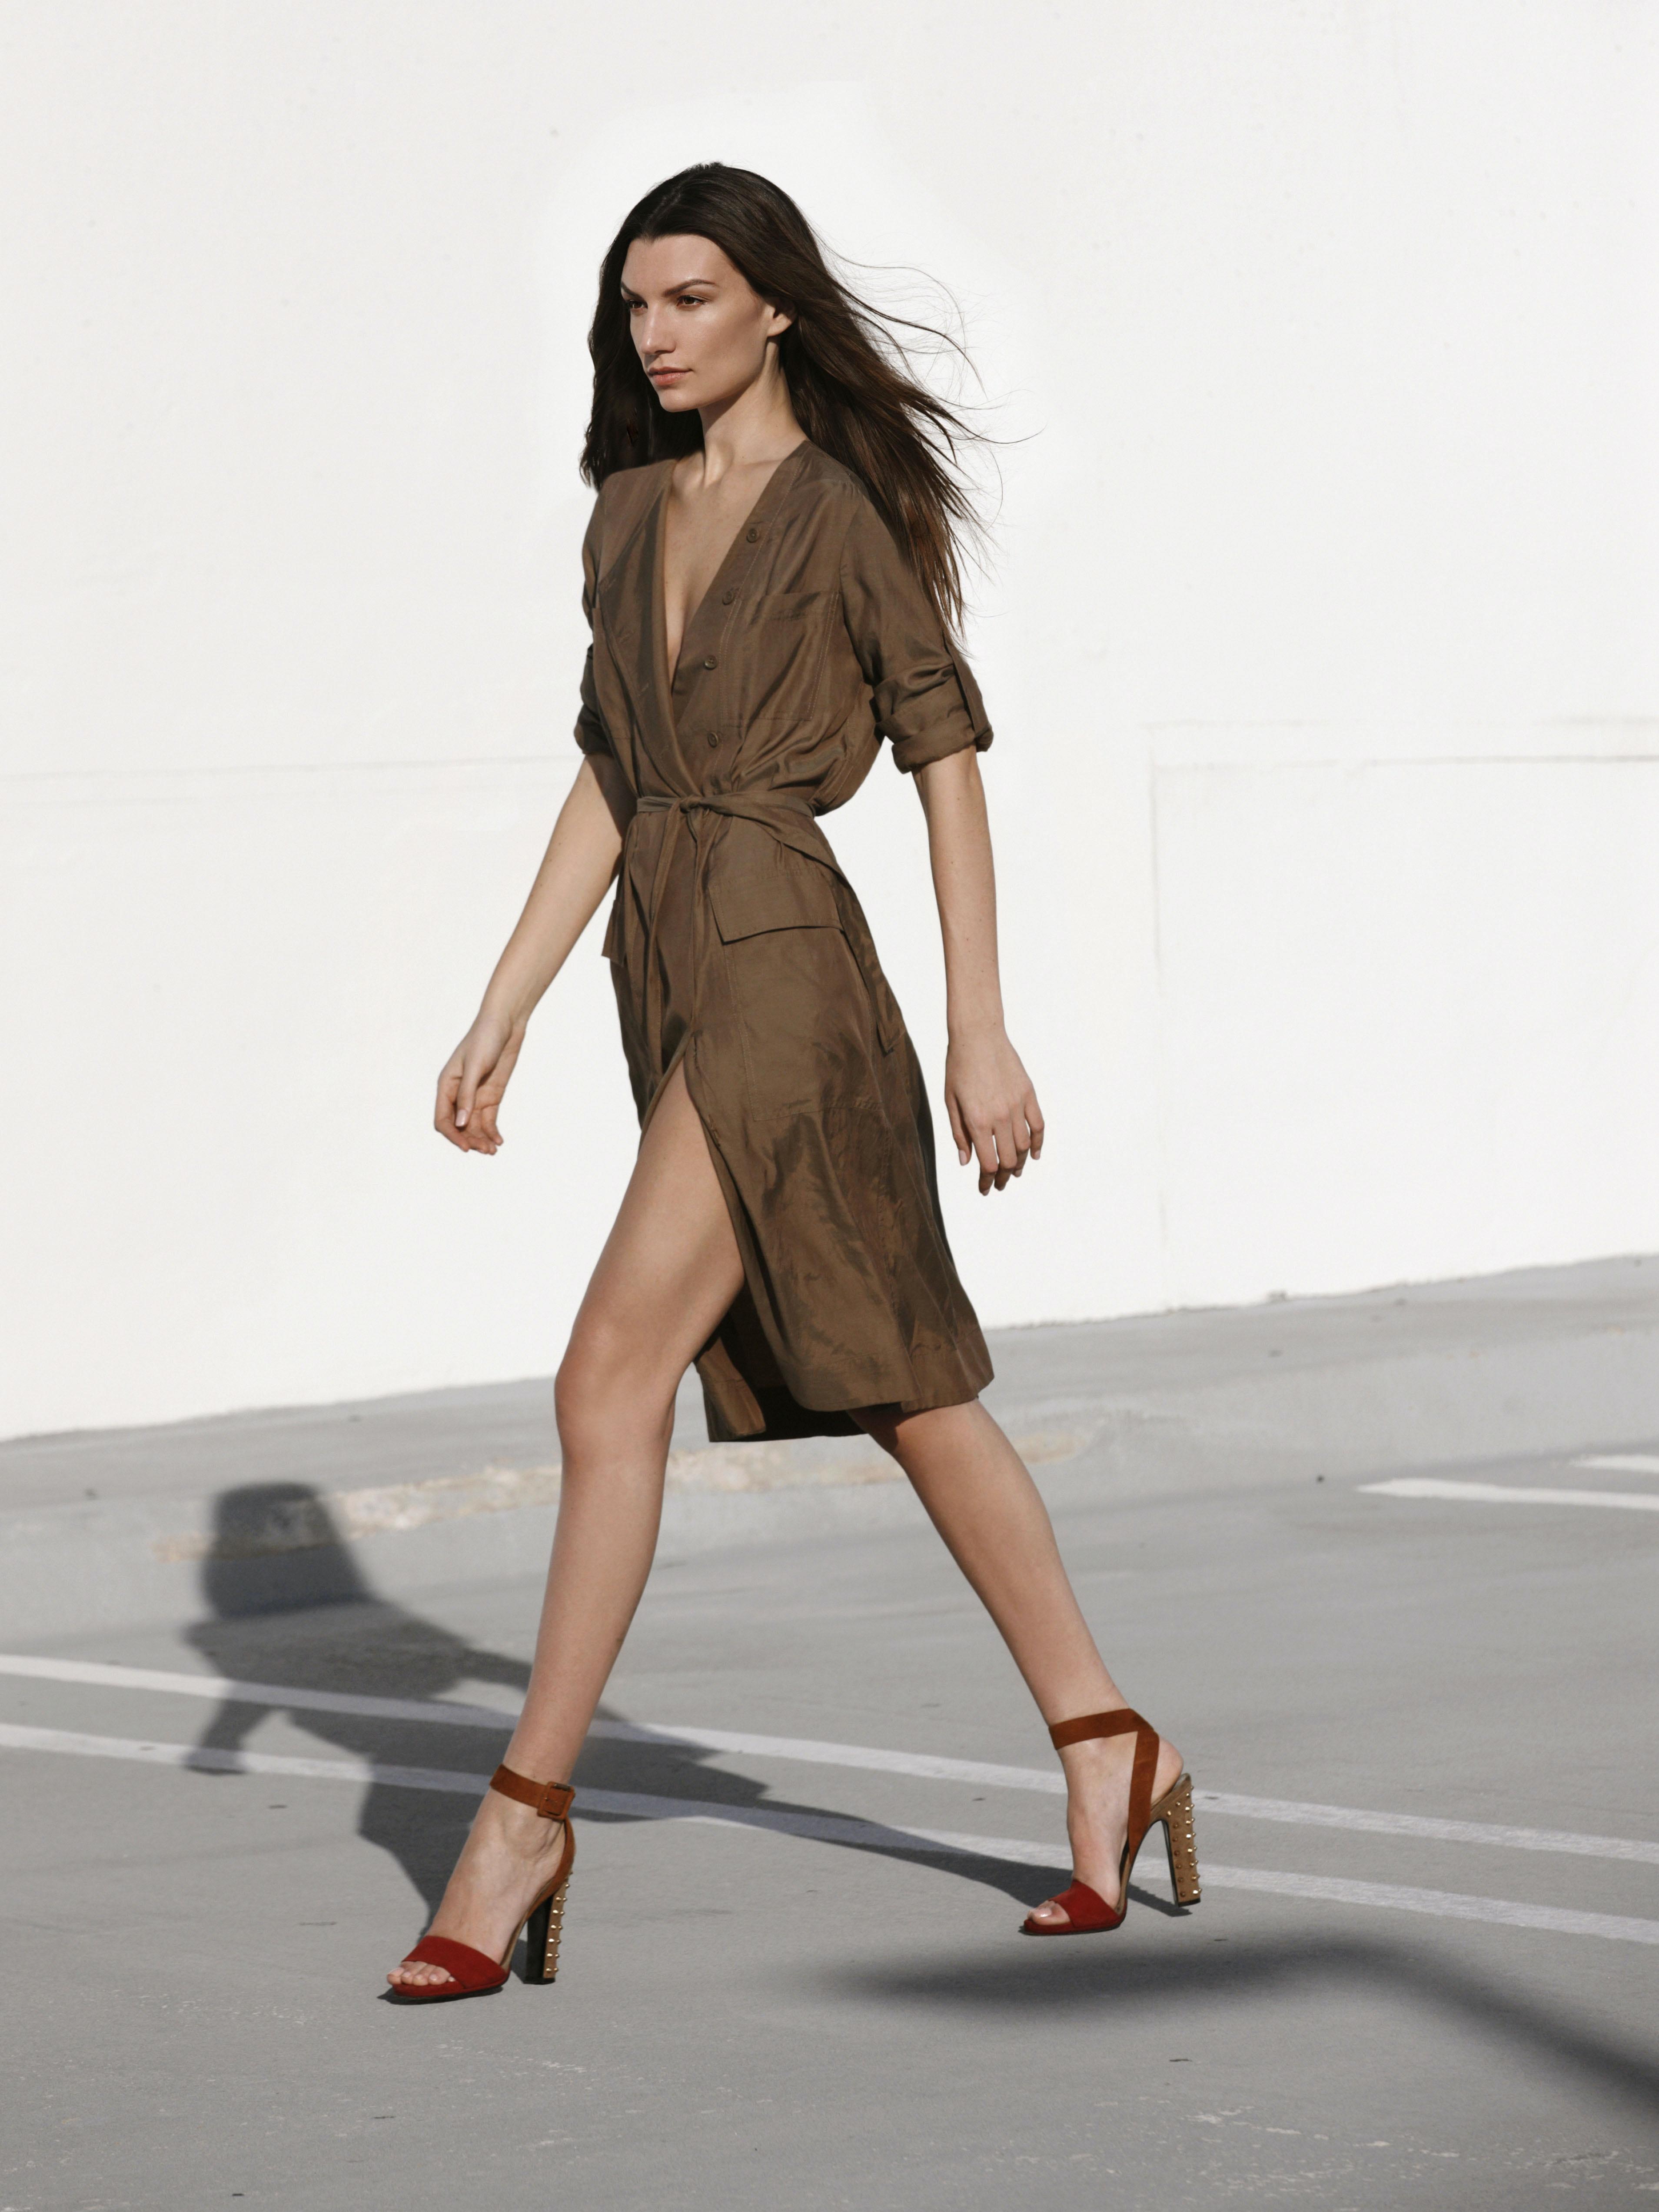 woman in brown dress walking on gray asphalt road